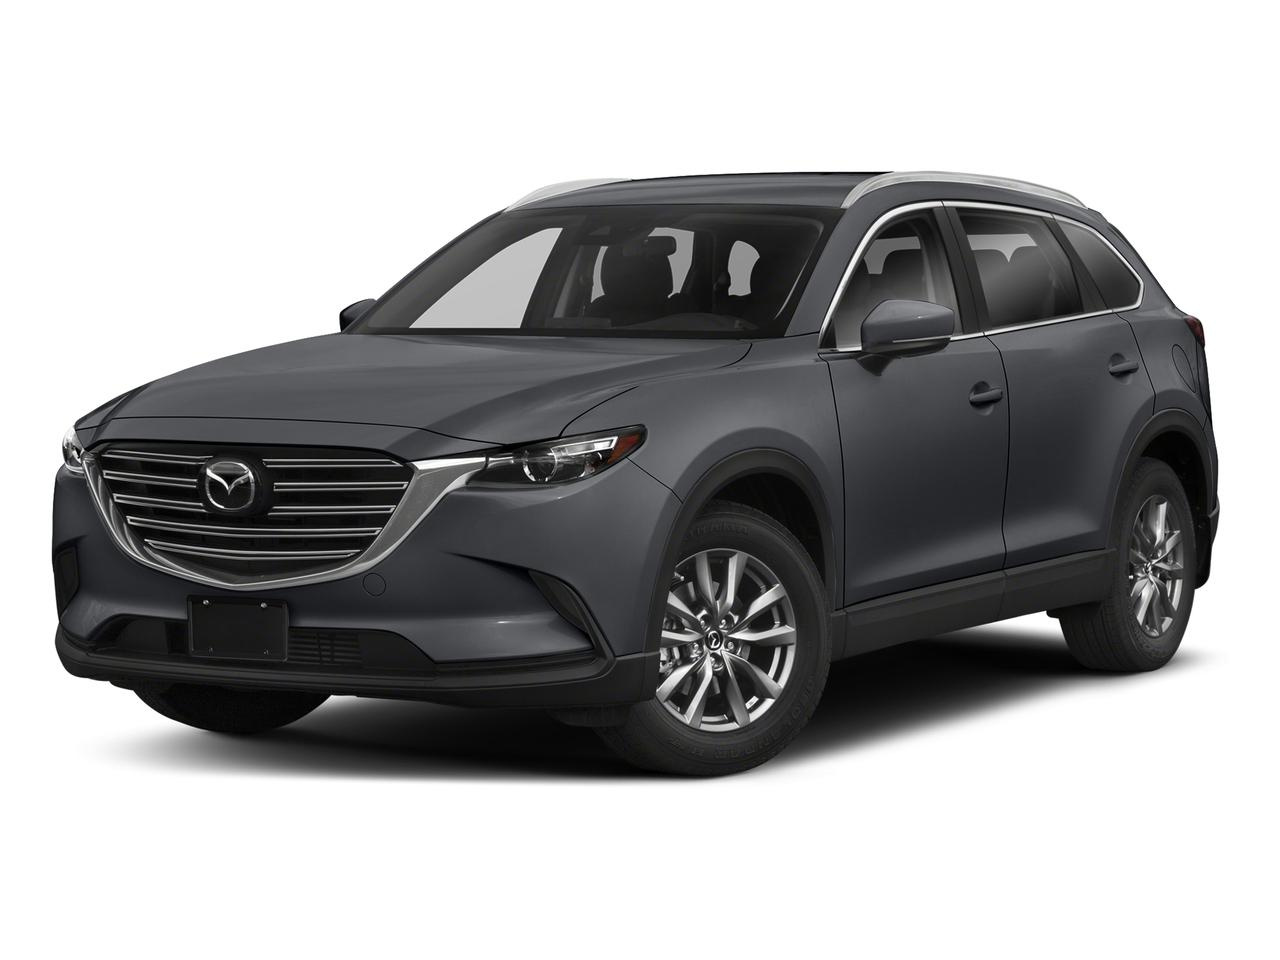 2018 Mazda CX-9 Vehicle Photo in Joliet, IL 60586